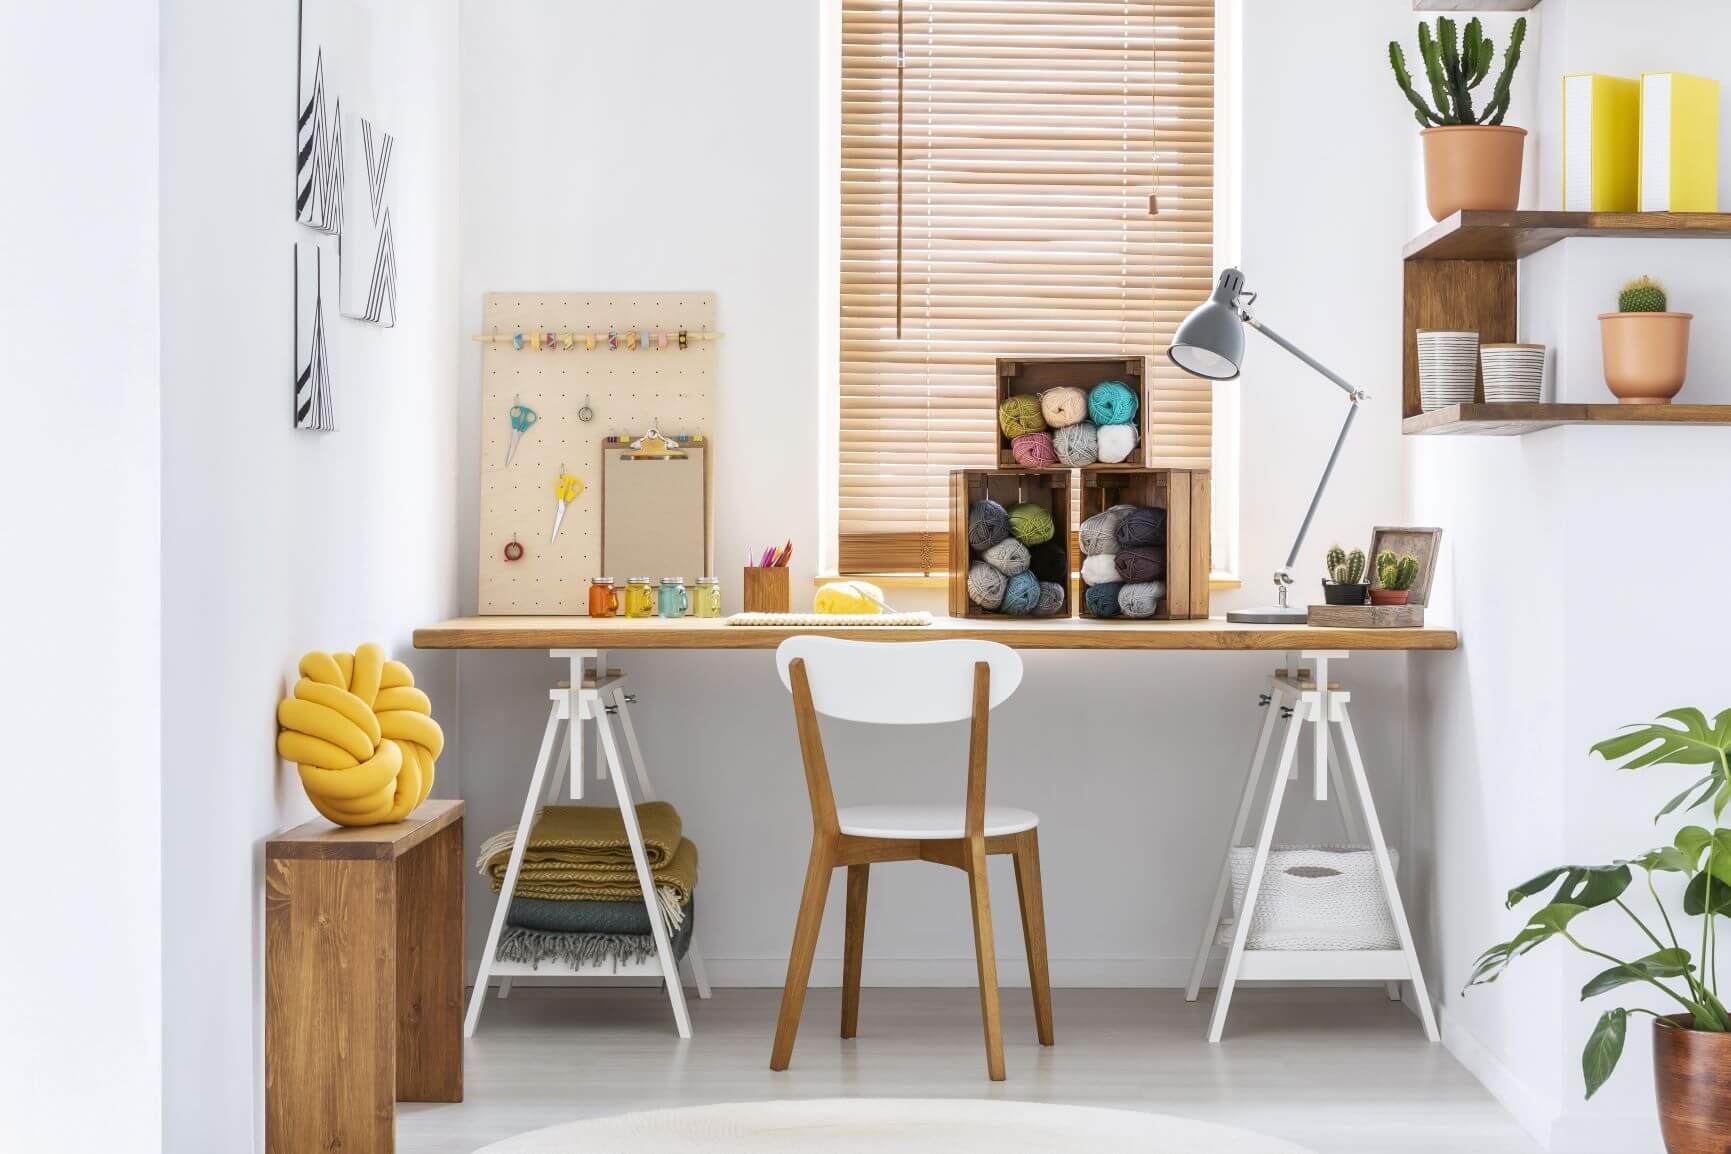 Hobby Workspace At Home Storage Ideas